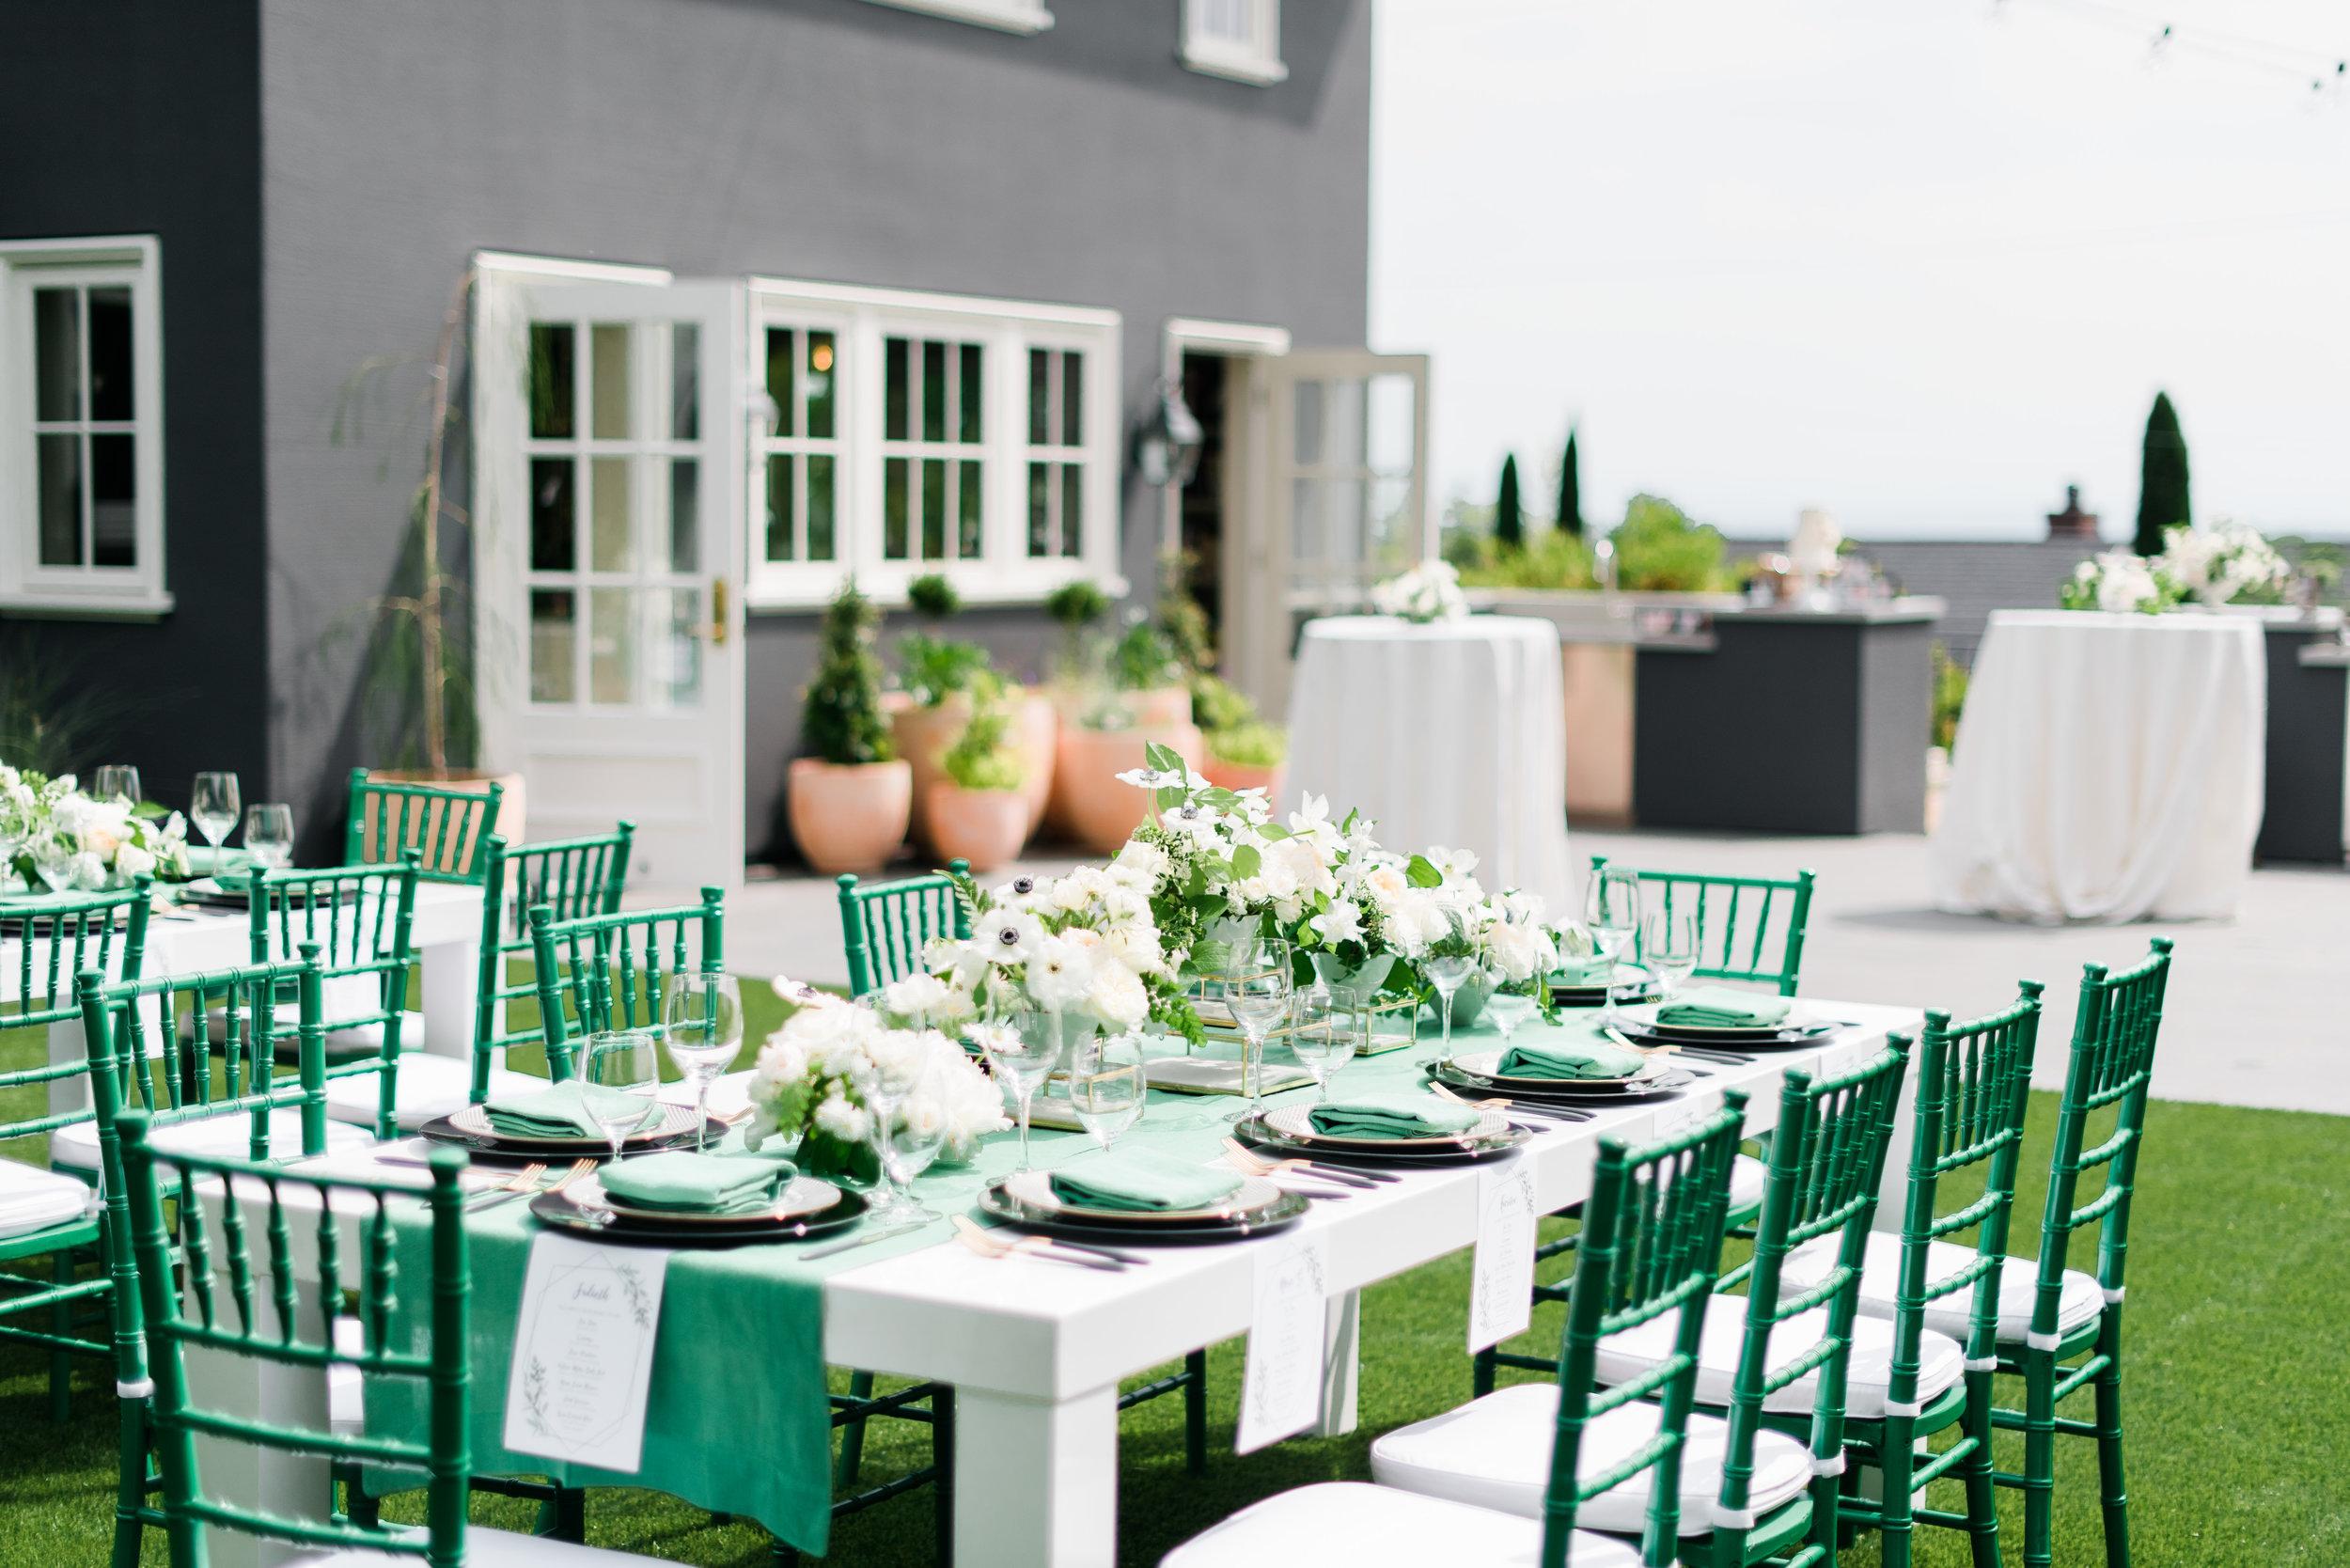 Bridalbliss.com   Portland Wedding   Oregon Event Planning and Design   Deyla Huss Photography  